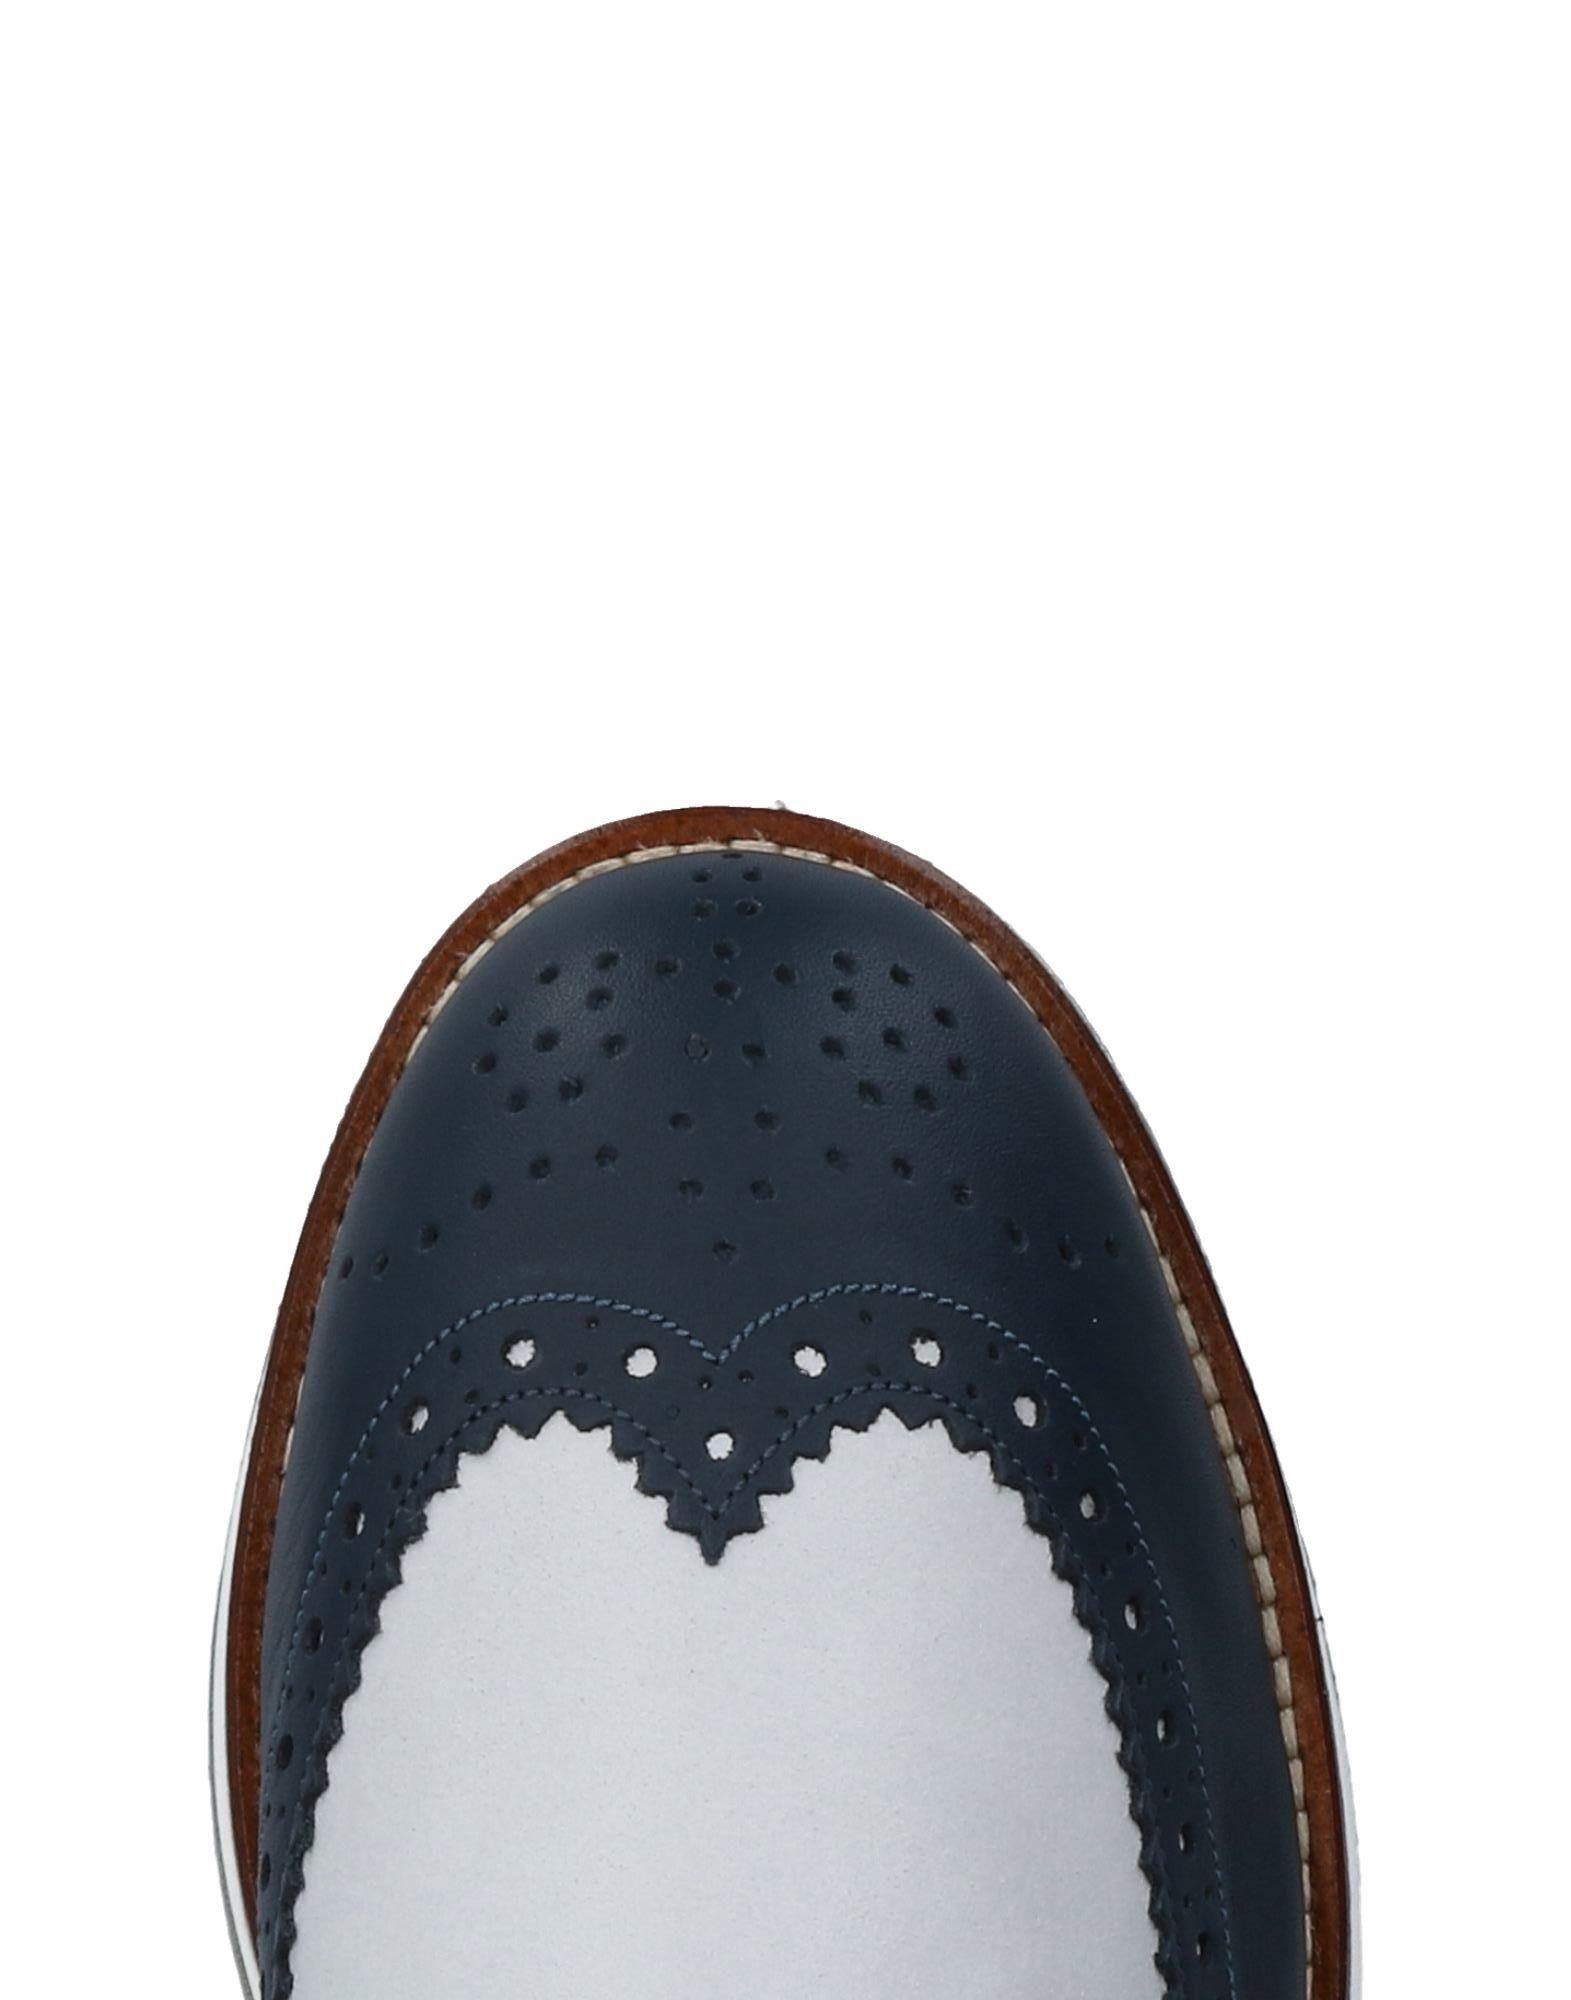 Barleycorn Gute Sneakers Herren  11467332AD Gute Barleycorn Qualität beliebte Schuhe e67bda